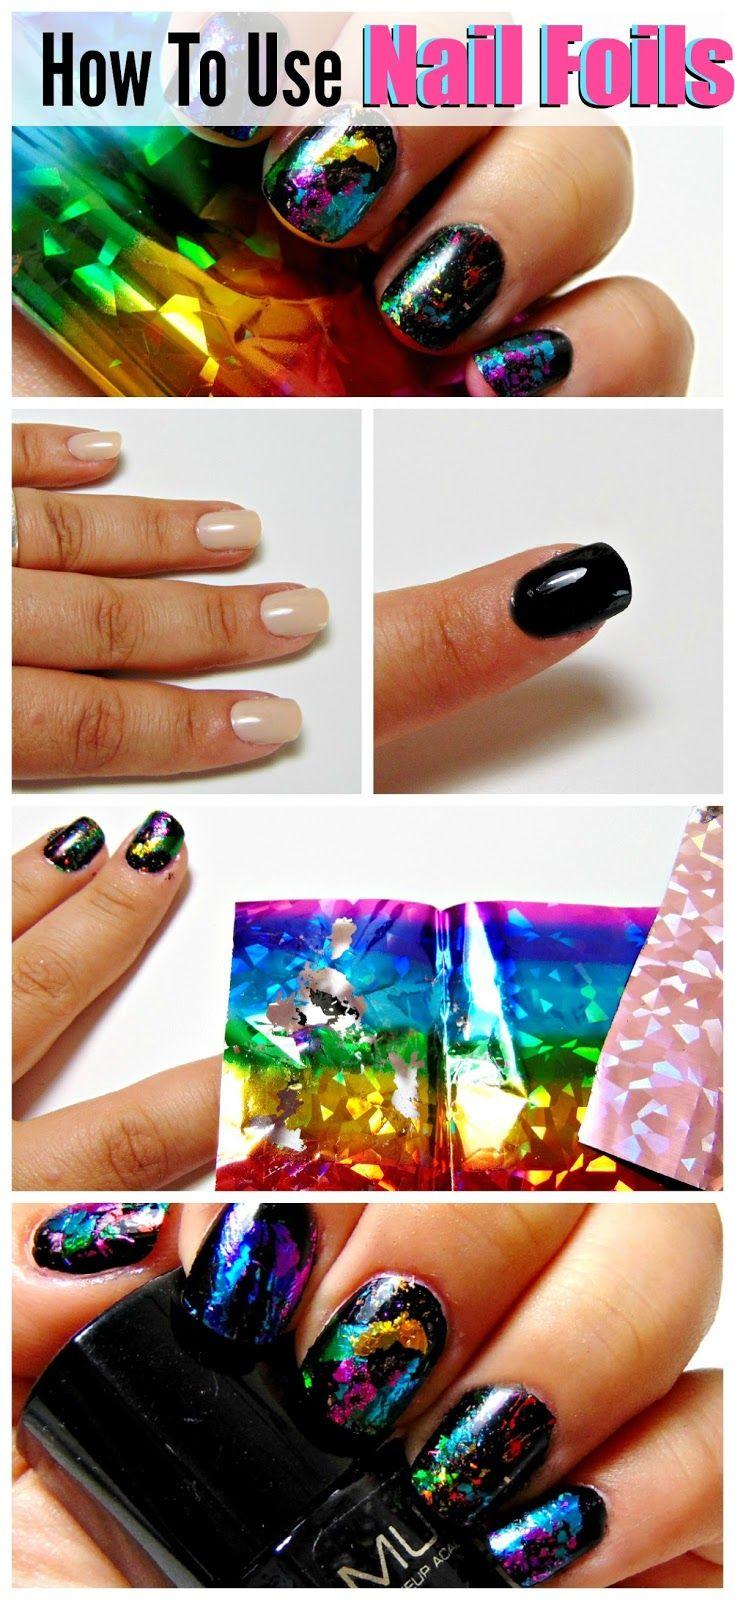 Mani Monday - Rainbow Nail Foil Mani